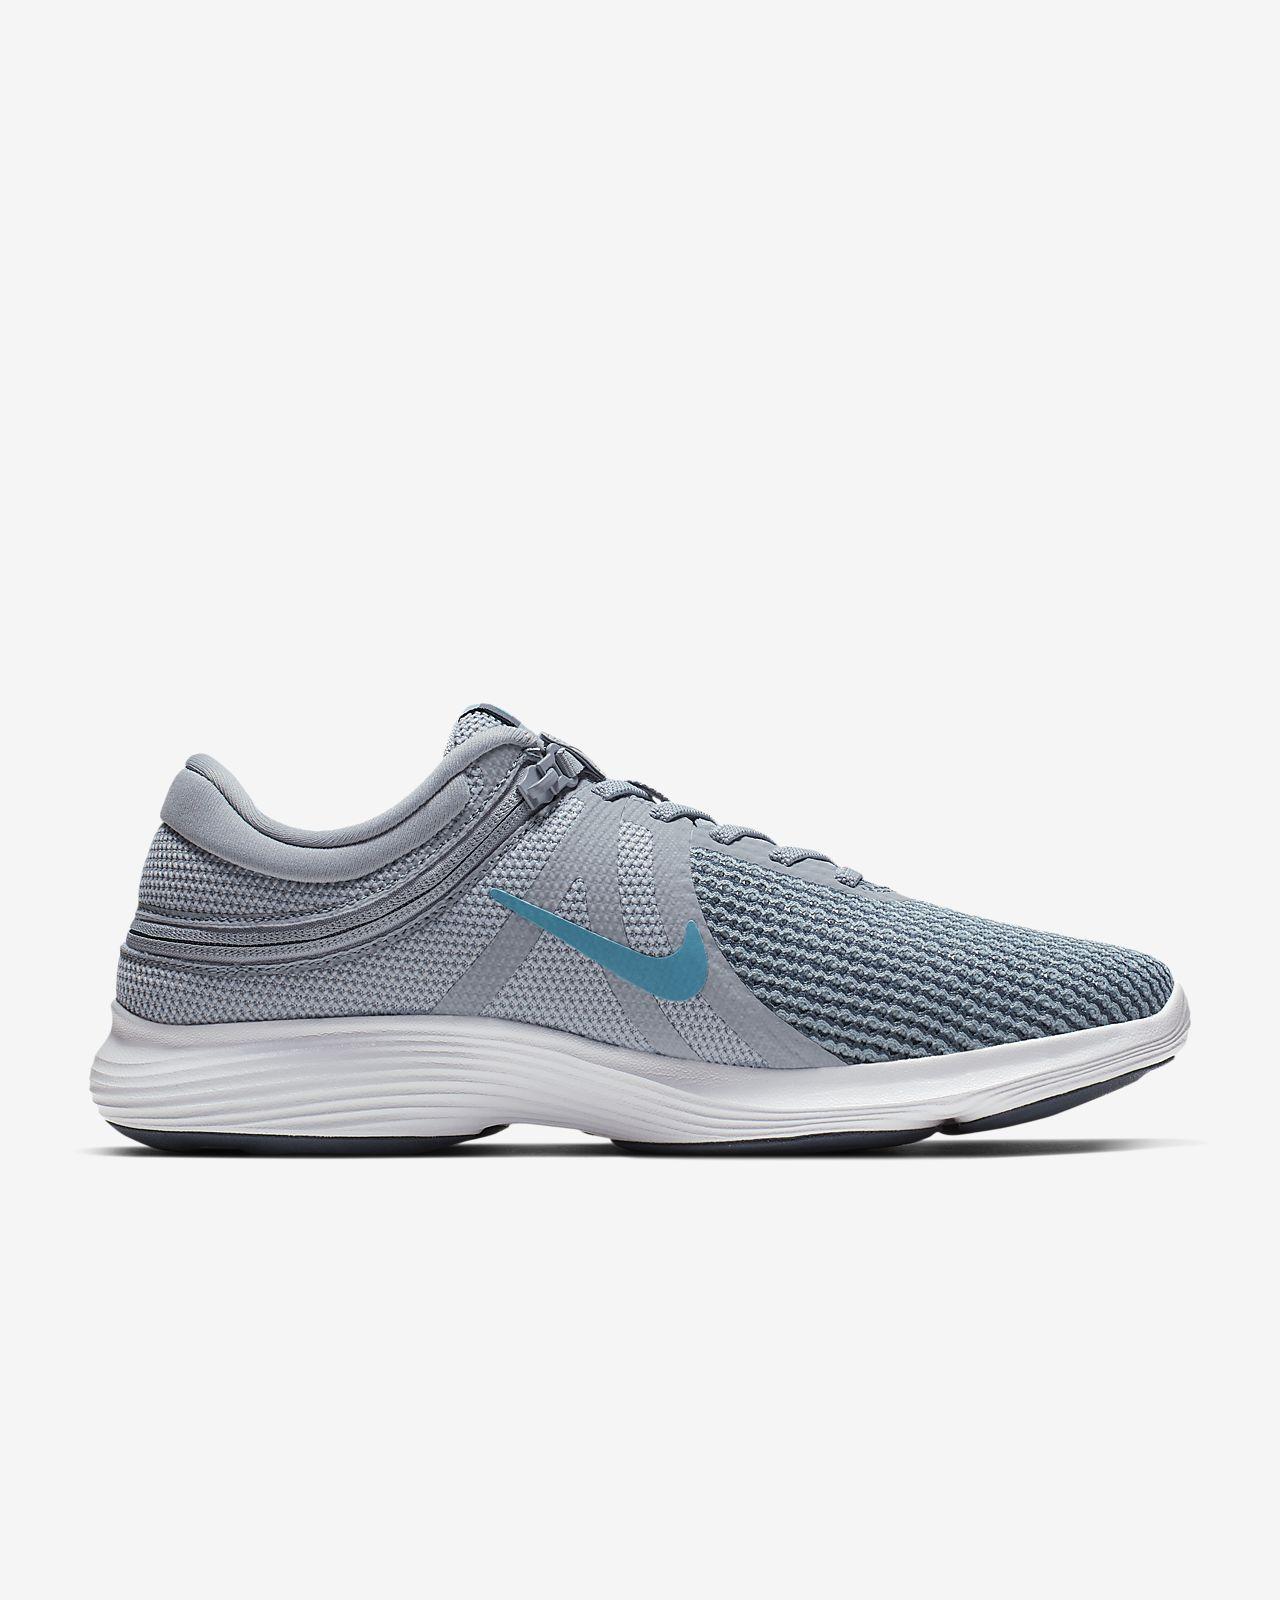 fe42a828f48b Nike Revolution 4 FlyEase Men s Running Shoe. Nike.com AU